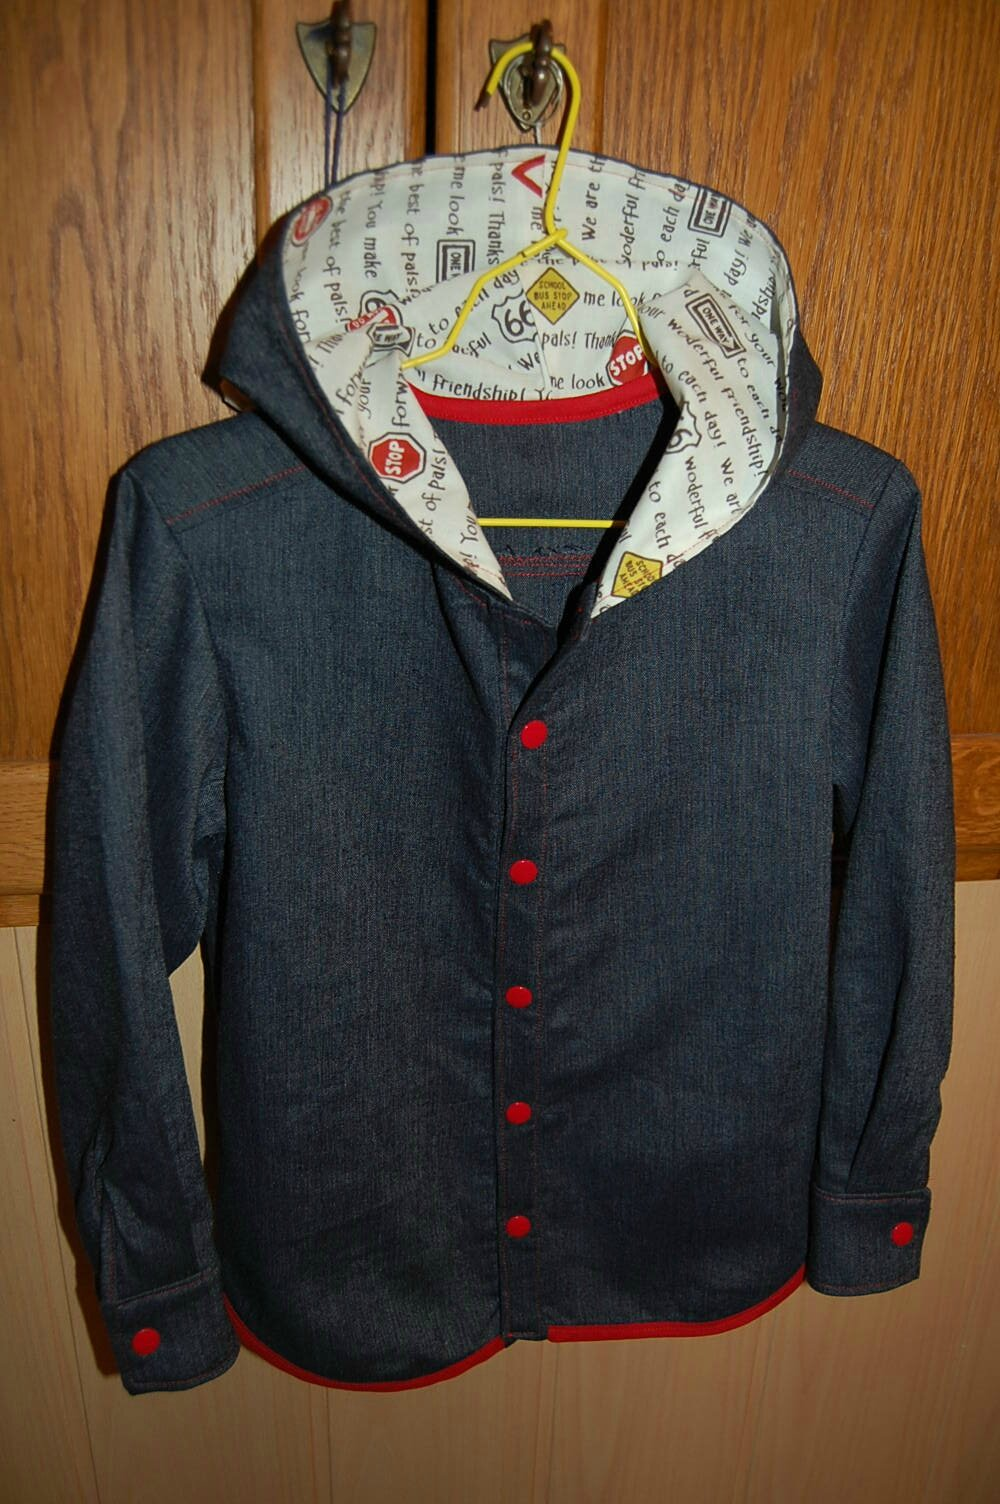 Chemise à capuche - JCA 329